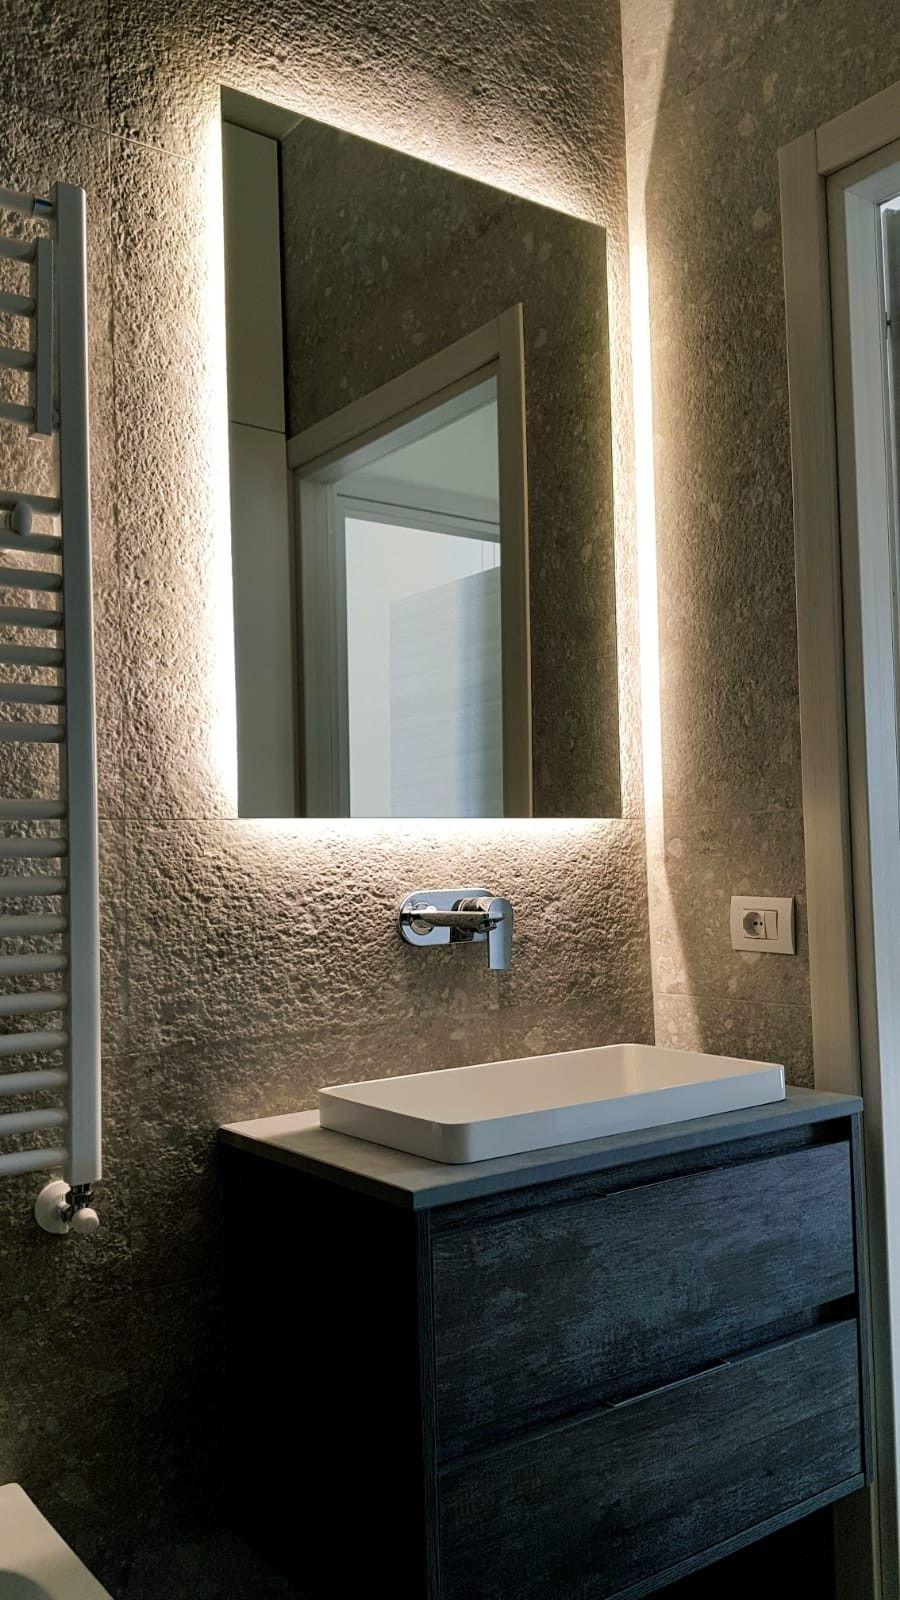 Specchio Retroilluminato Lavoromanzoni In 2020 Bathroom Lighting